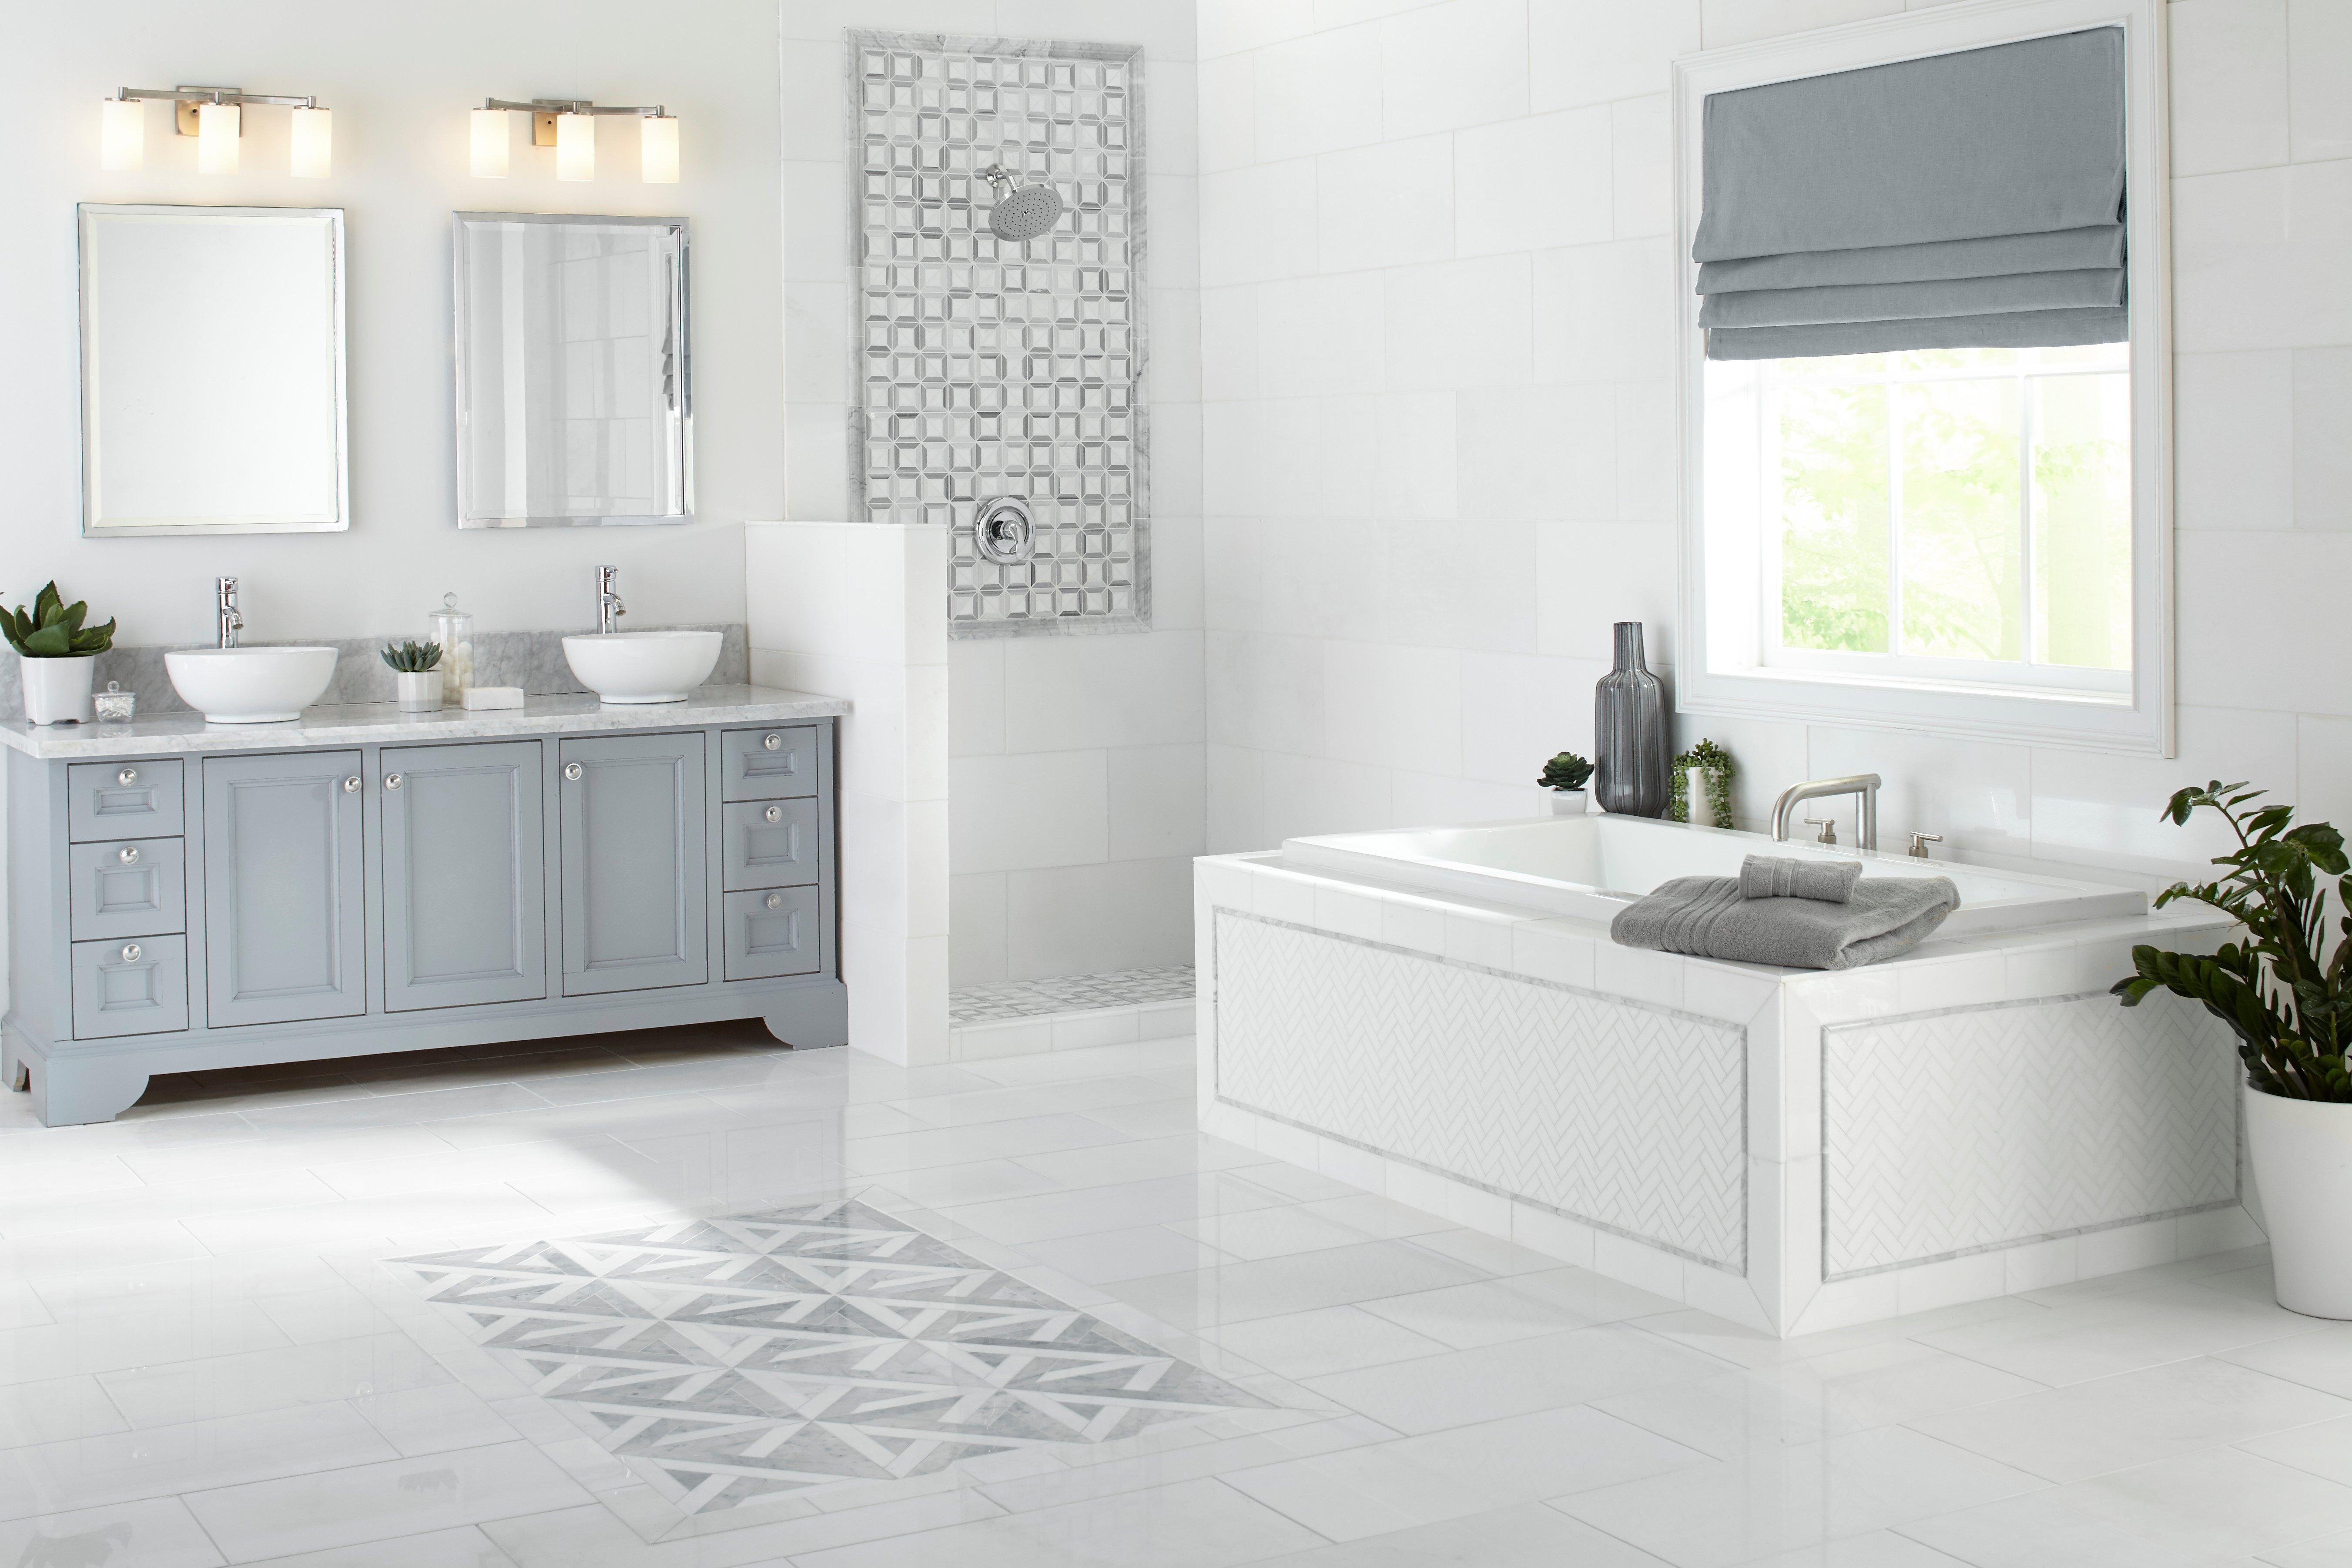 Floor And Decor Video 2019 Trend Preview Floor Decor Bathrooms Remodel Marble Bathroom